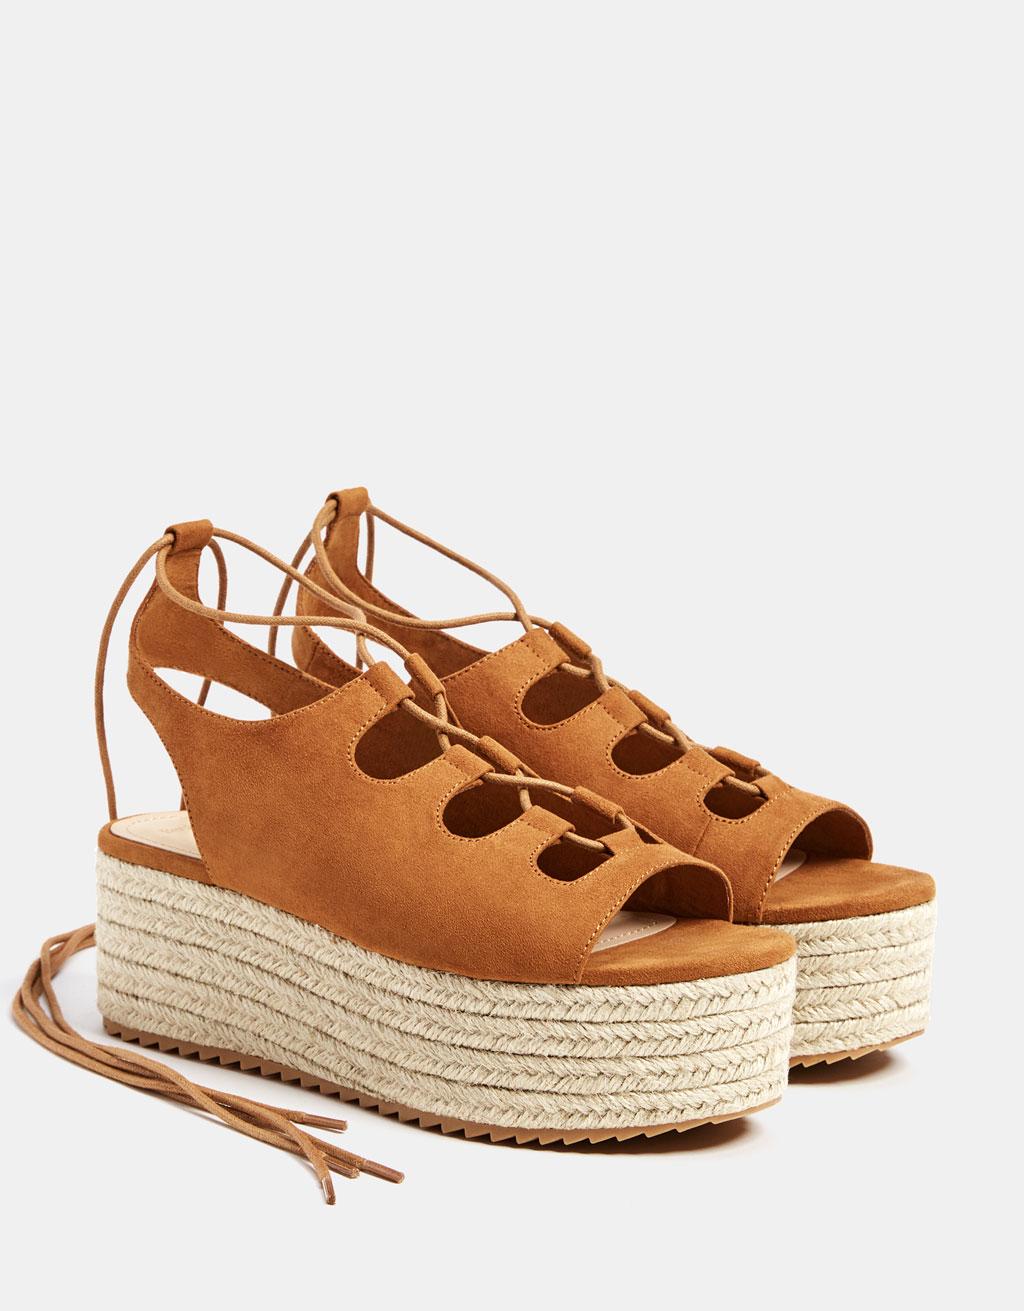 Сандалии со шнуровкой, на джутовой платформе